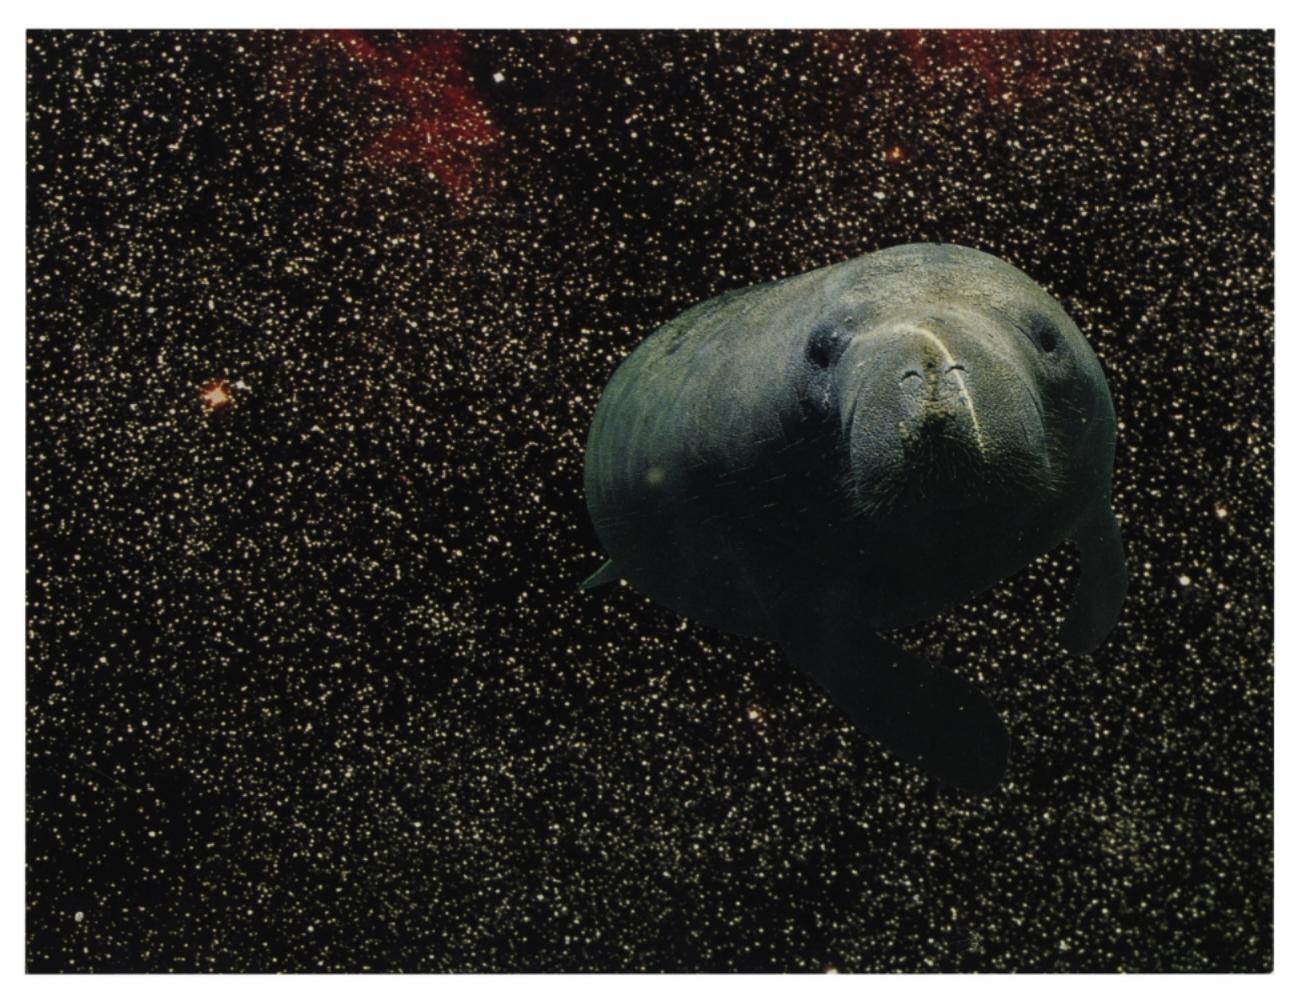 Cosmic Manatee